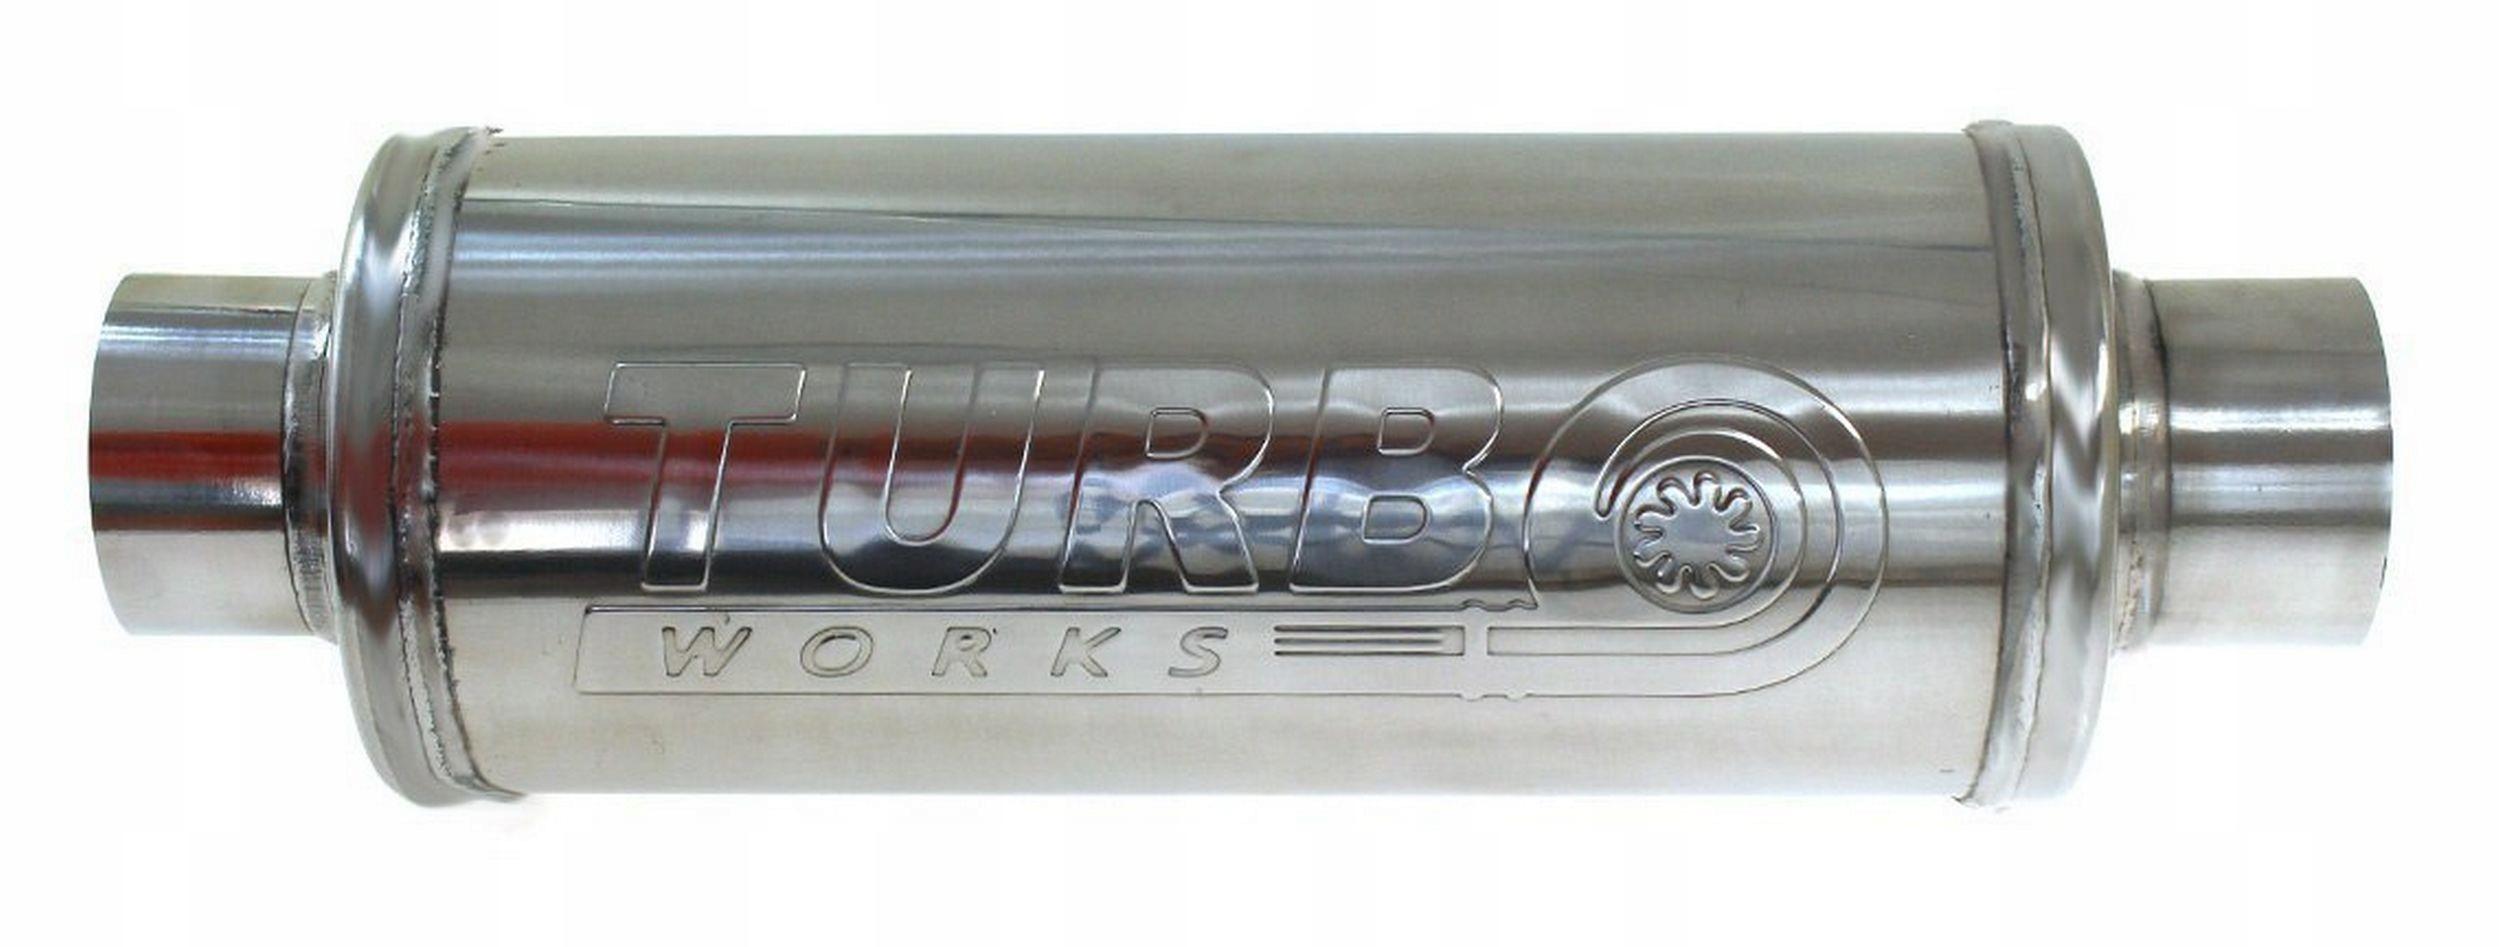 глушитель Средний 2 5'' 450mm спортивный turboworks